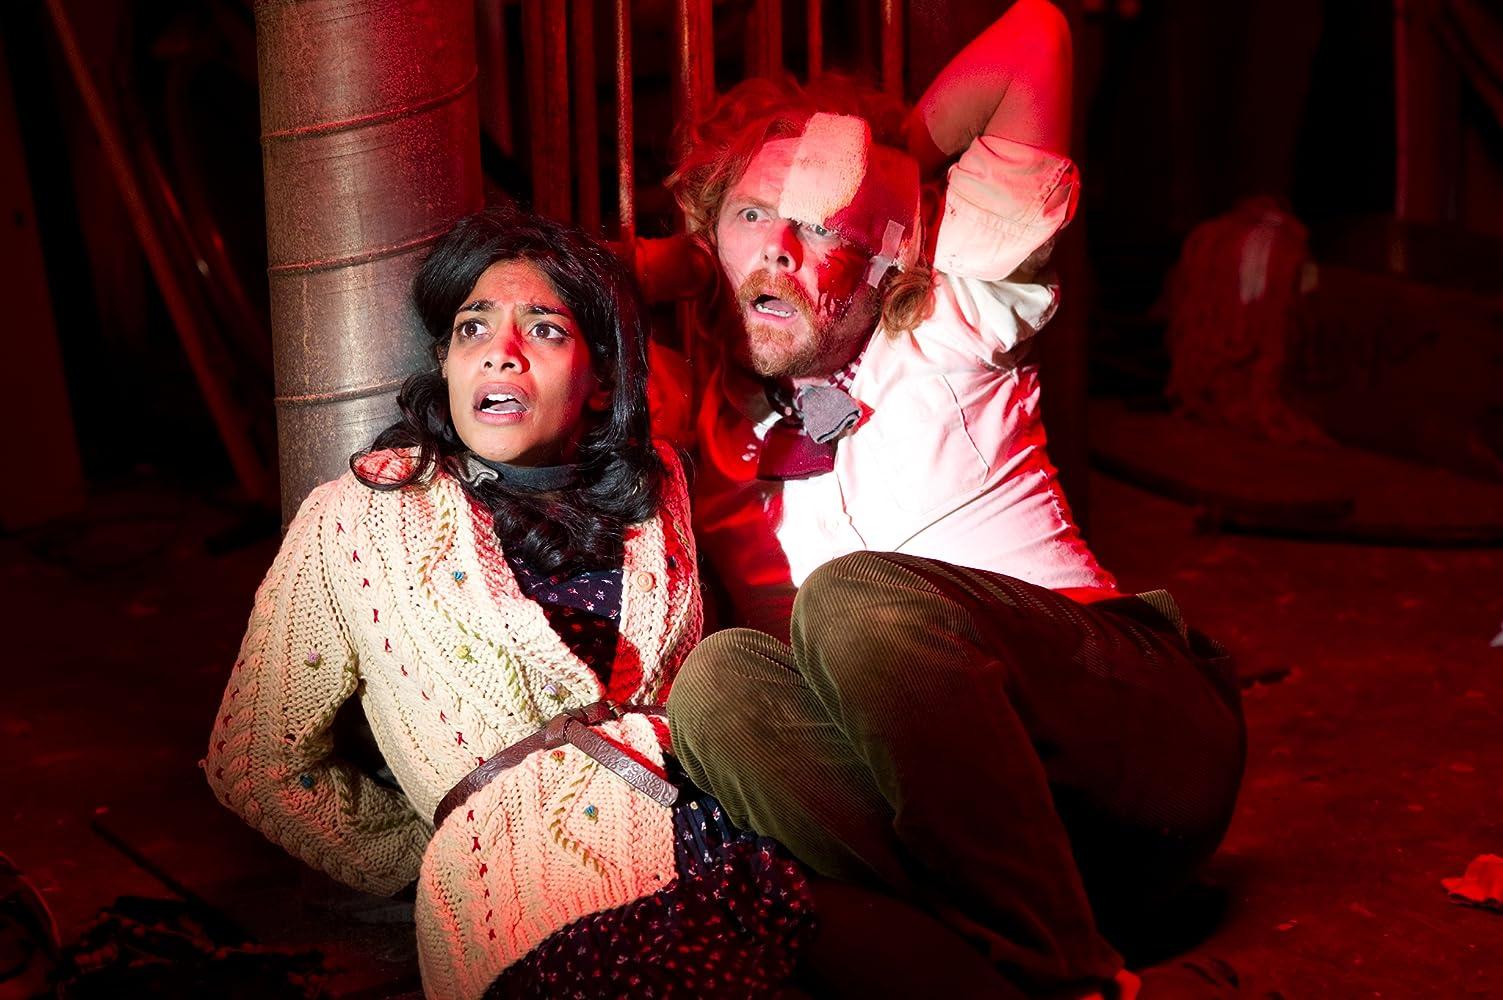 Simon Pegg and Amara Karan in A Fantastic Fear of Everything (2012)